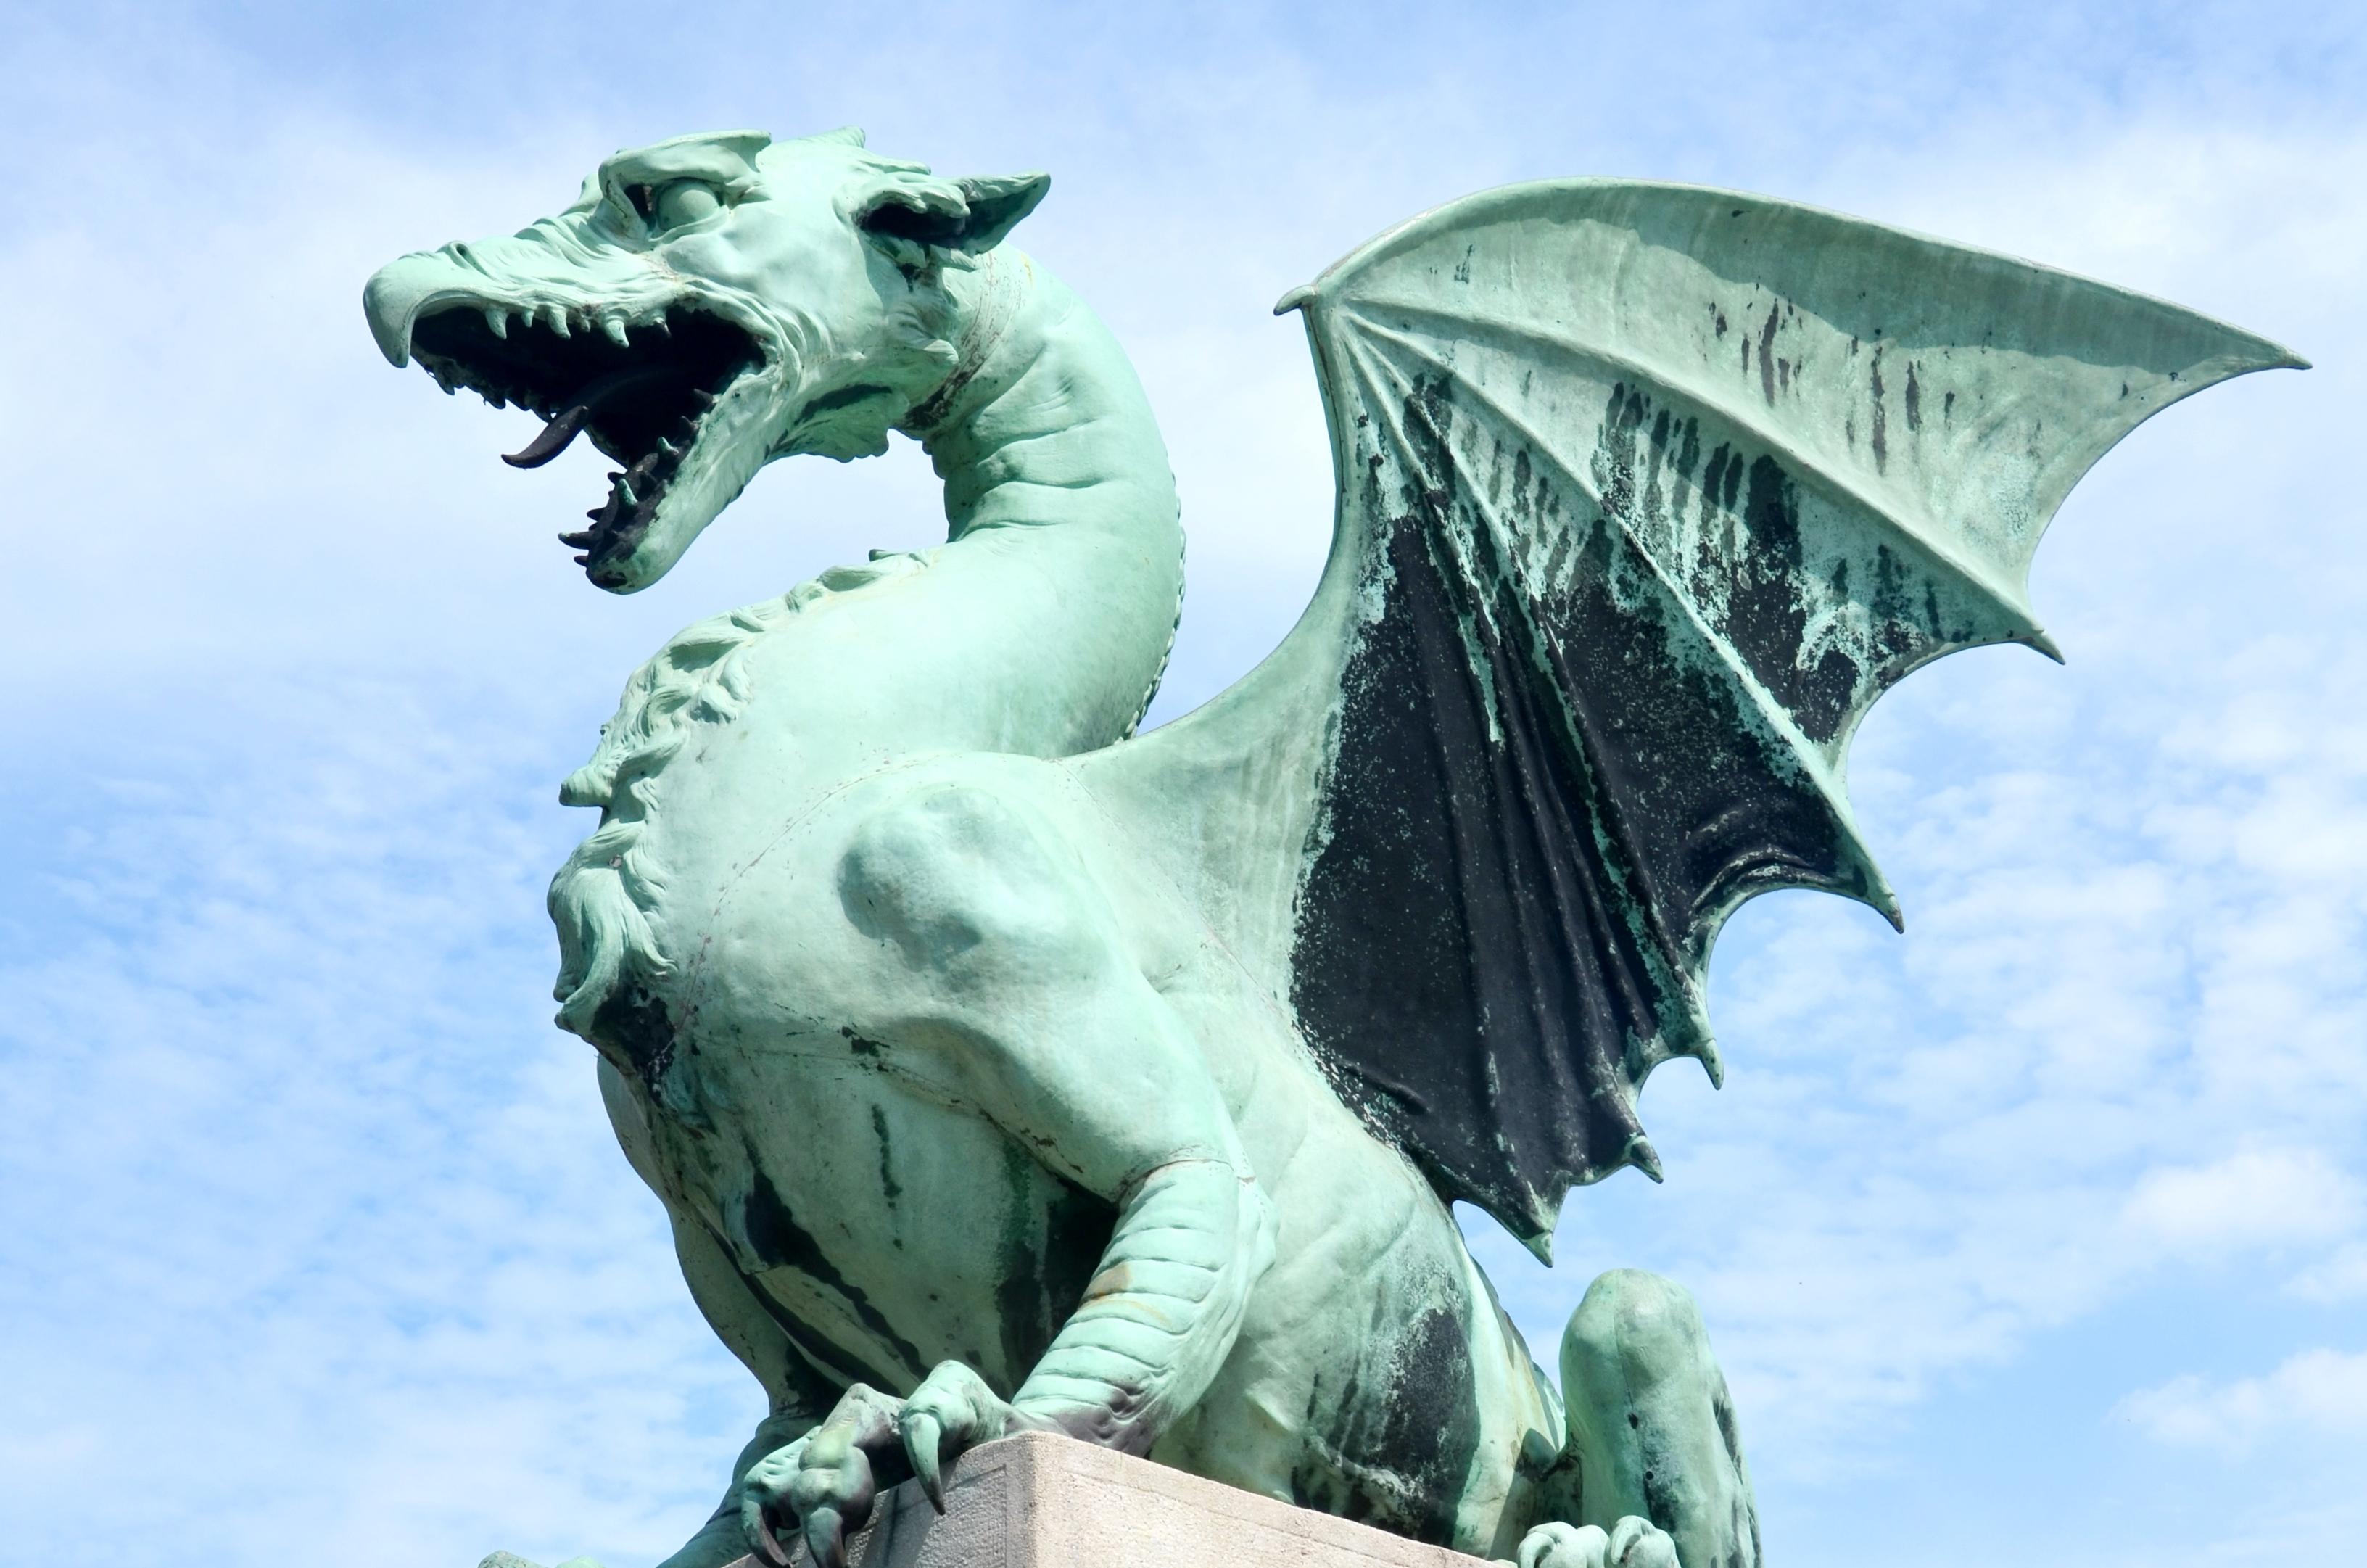 Lublana dragon